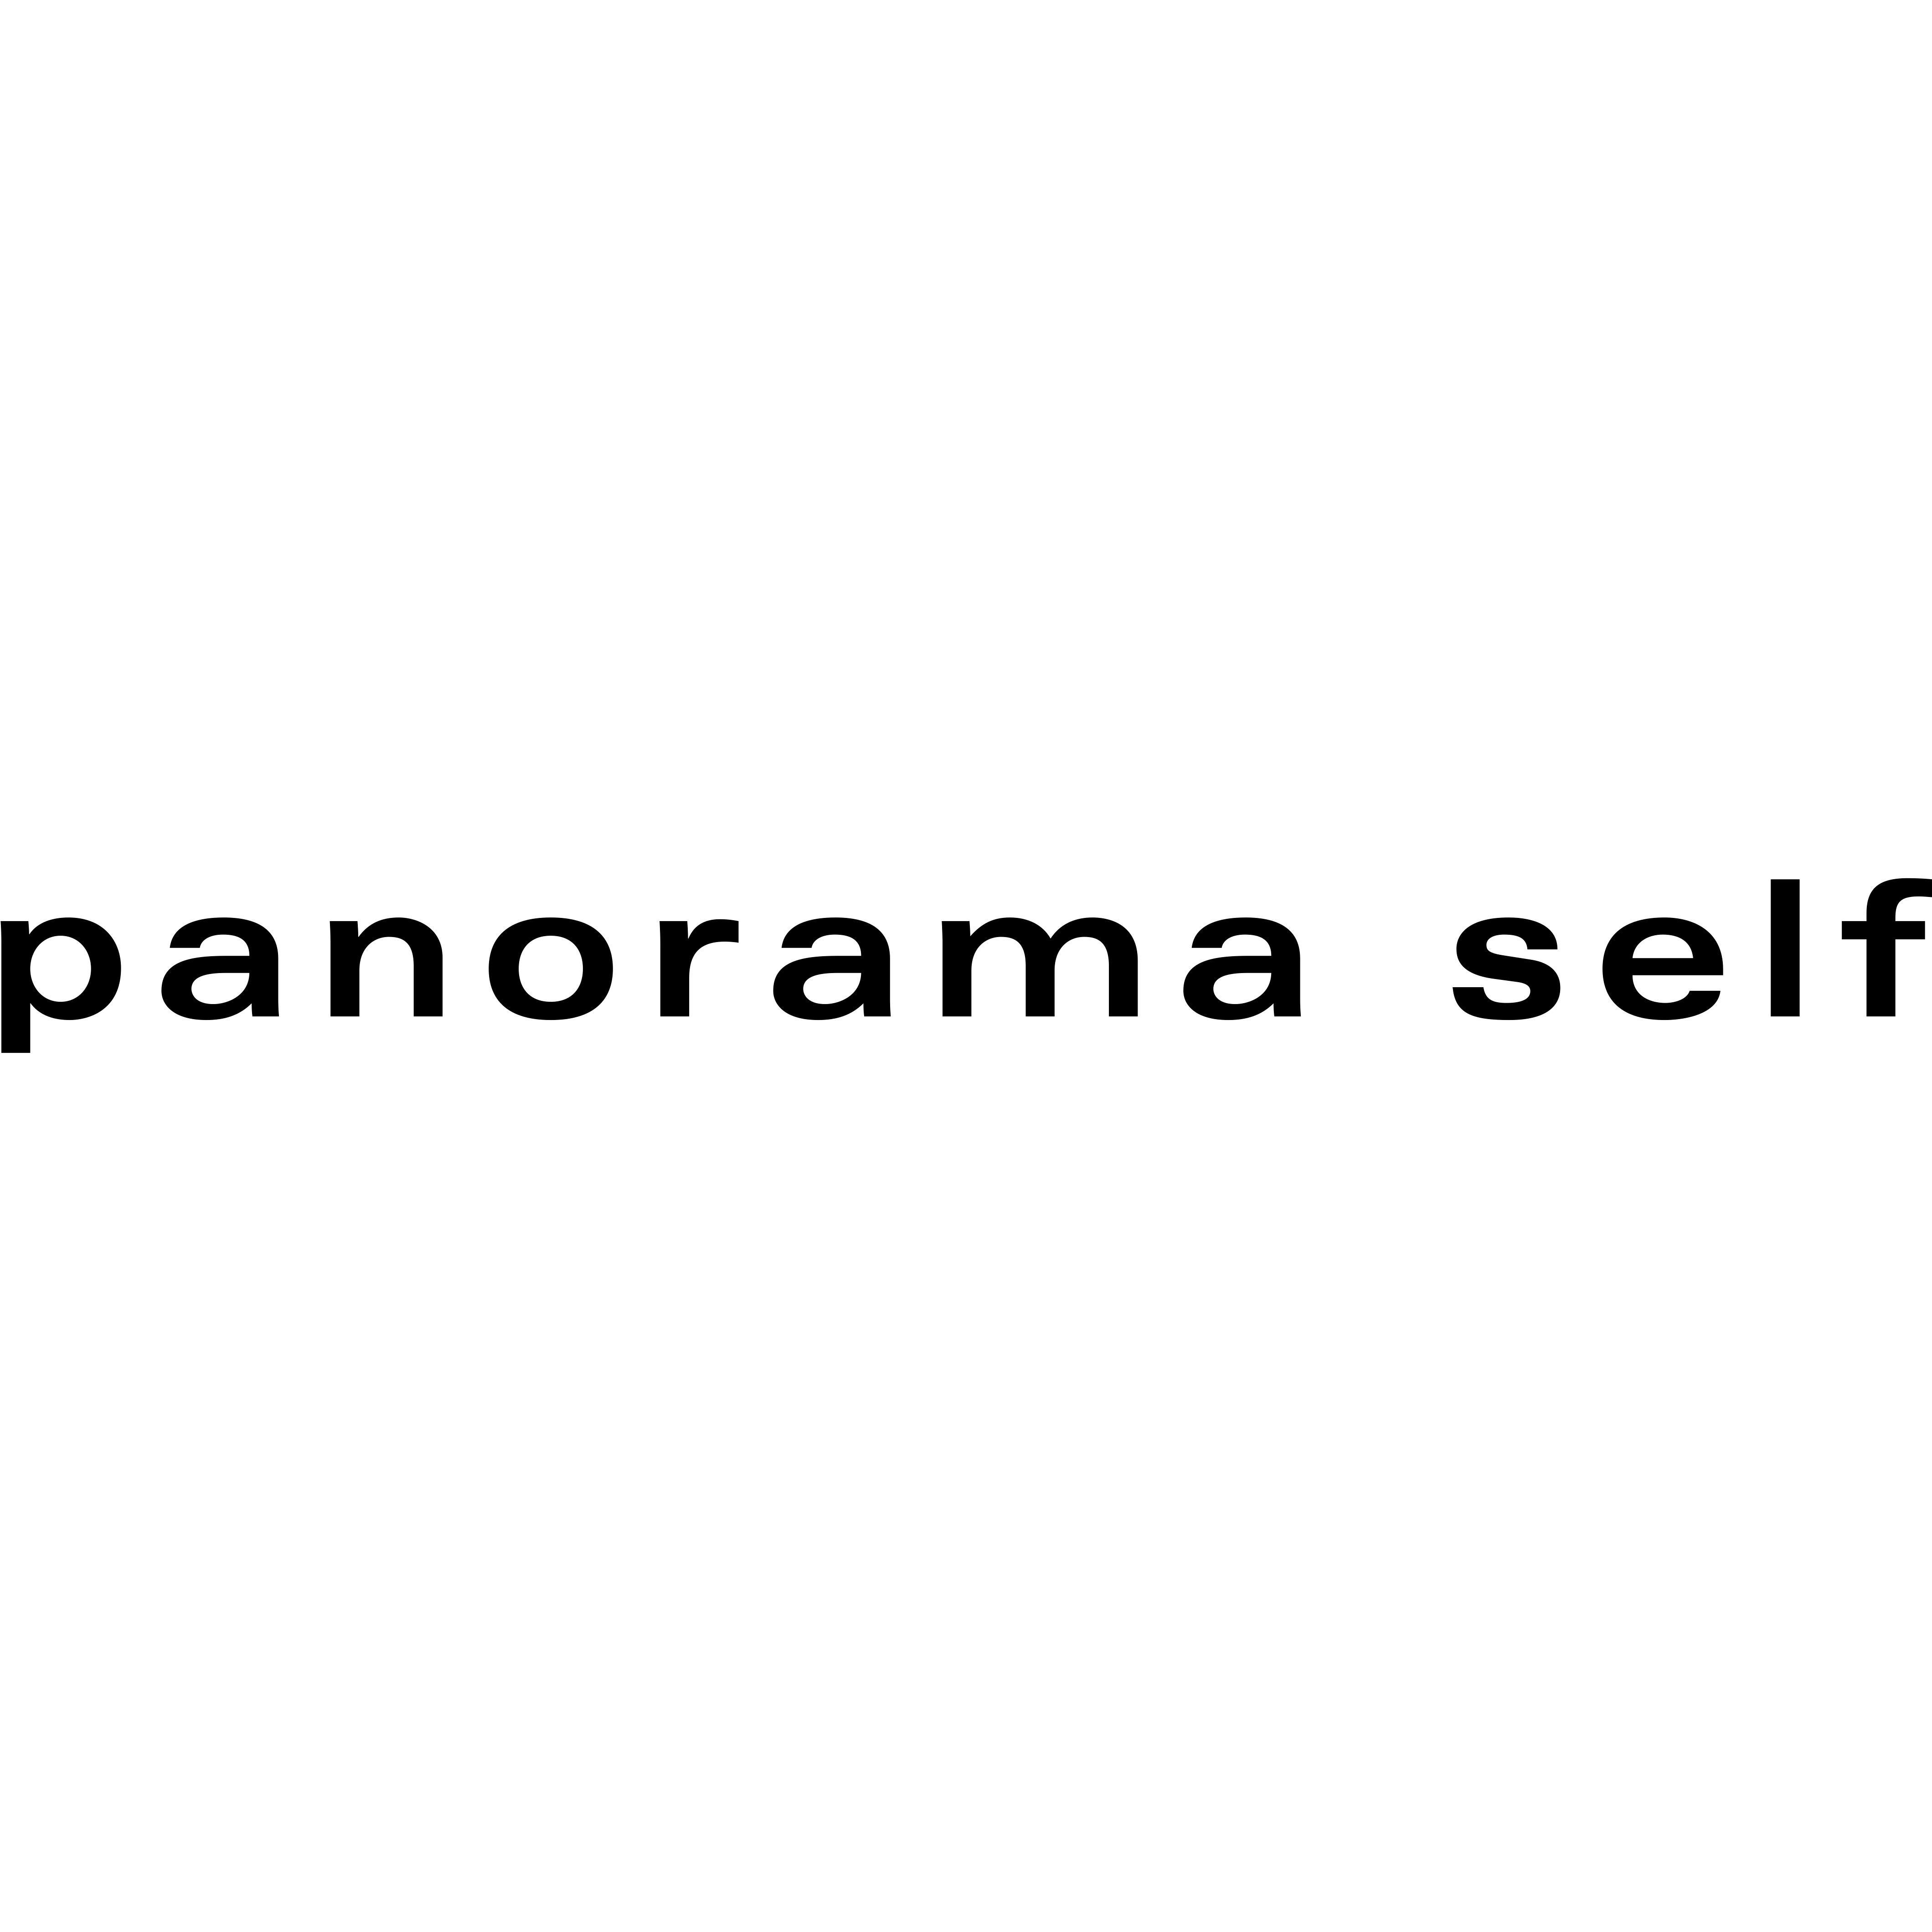 Panorama Self